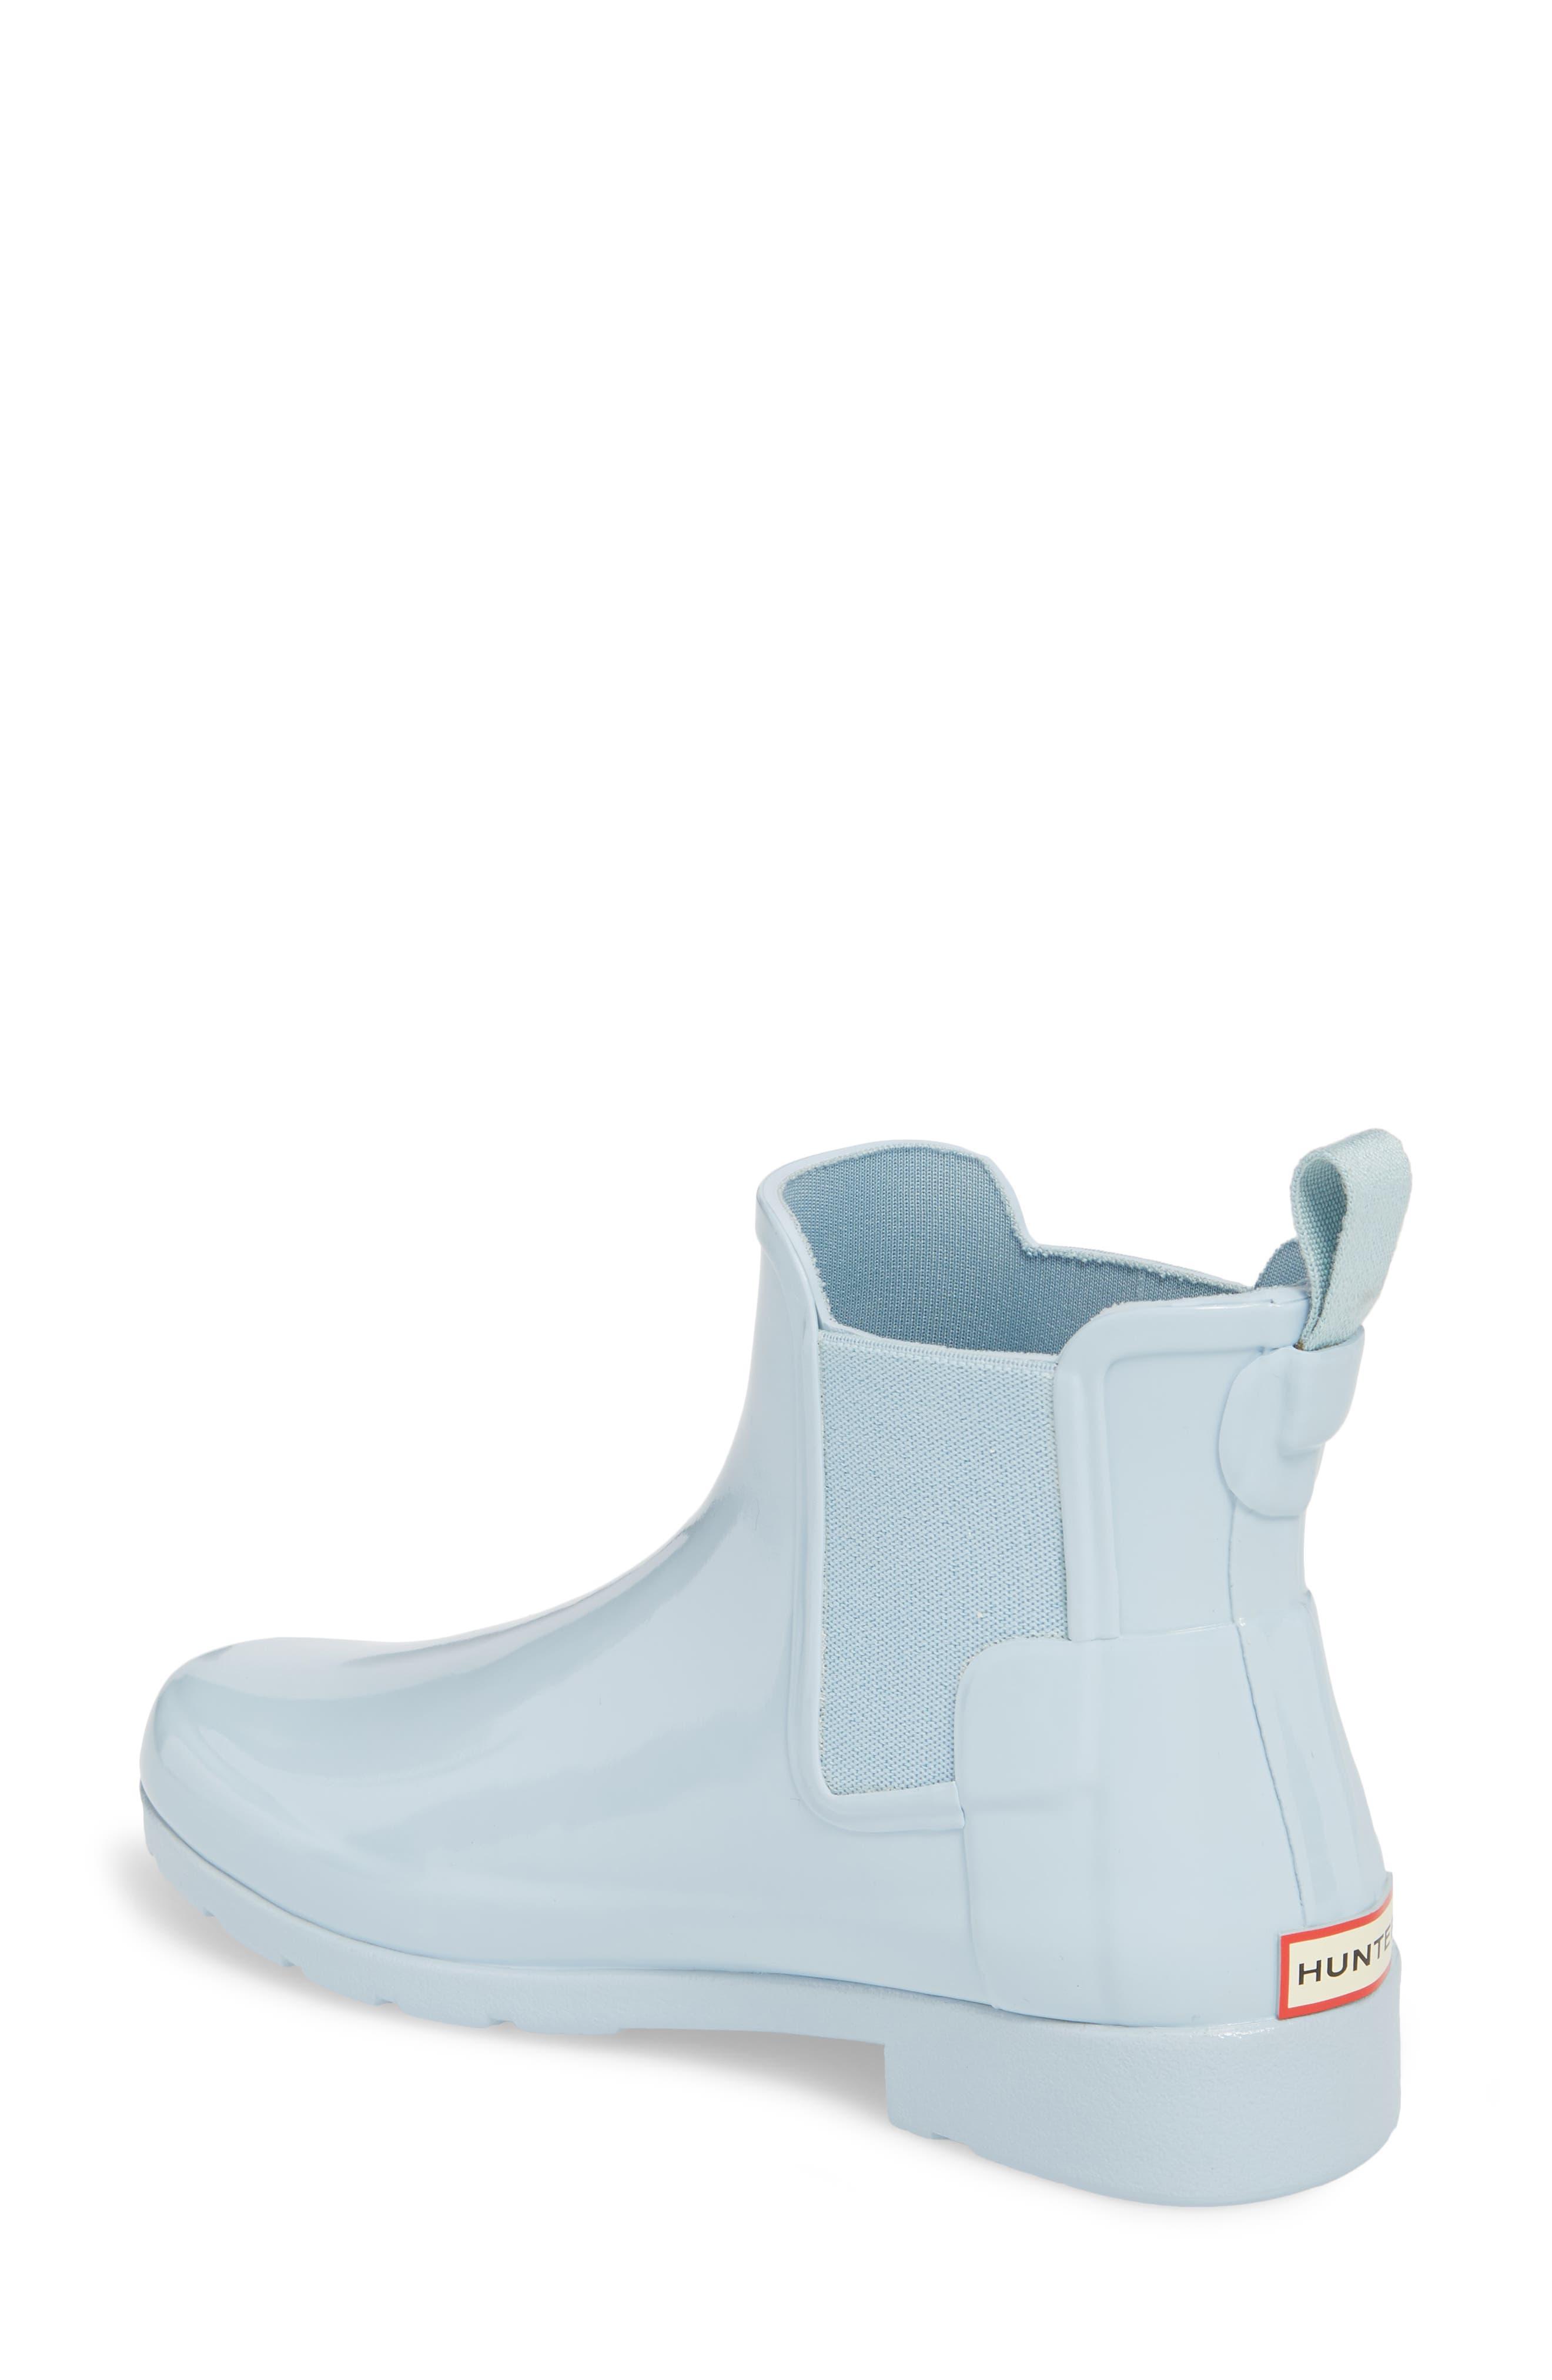 'Original Refined' Chelsea Rain Boot,                             Alternate thumbnail 2, color,                             Fountain Blue